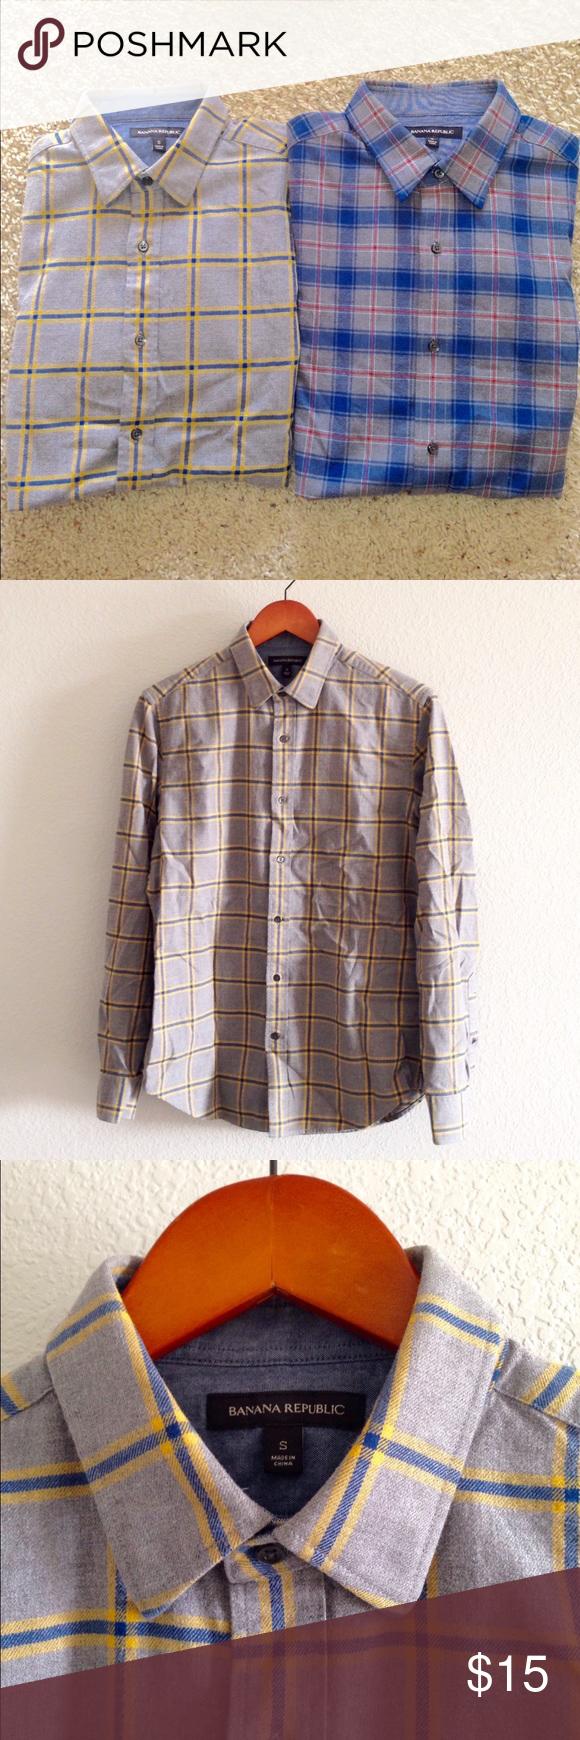 Orange flannel jacket  Banana Republic Bundle  Mens Flannel Shirts  Flannel shirts Blue